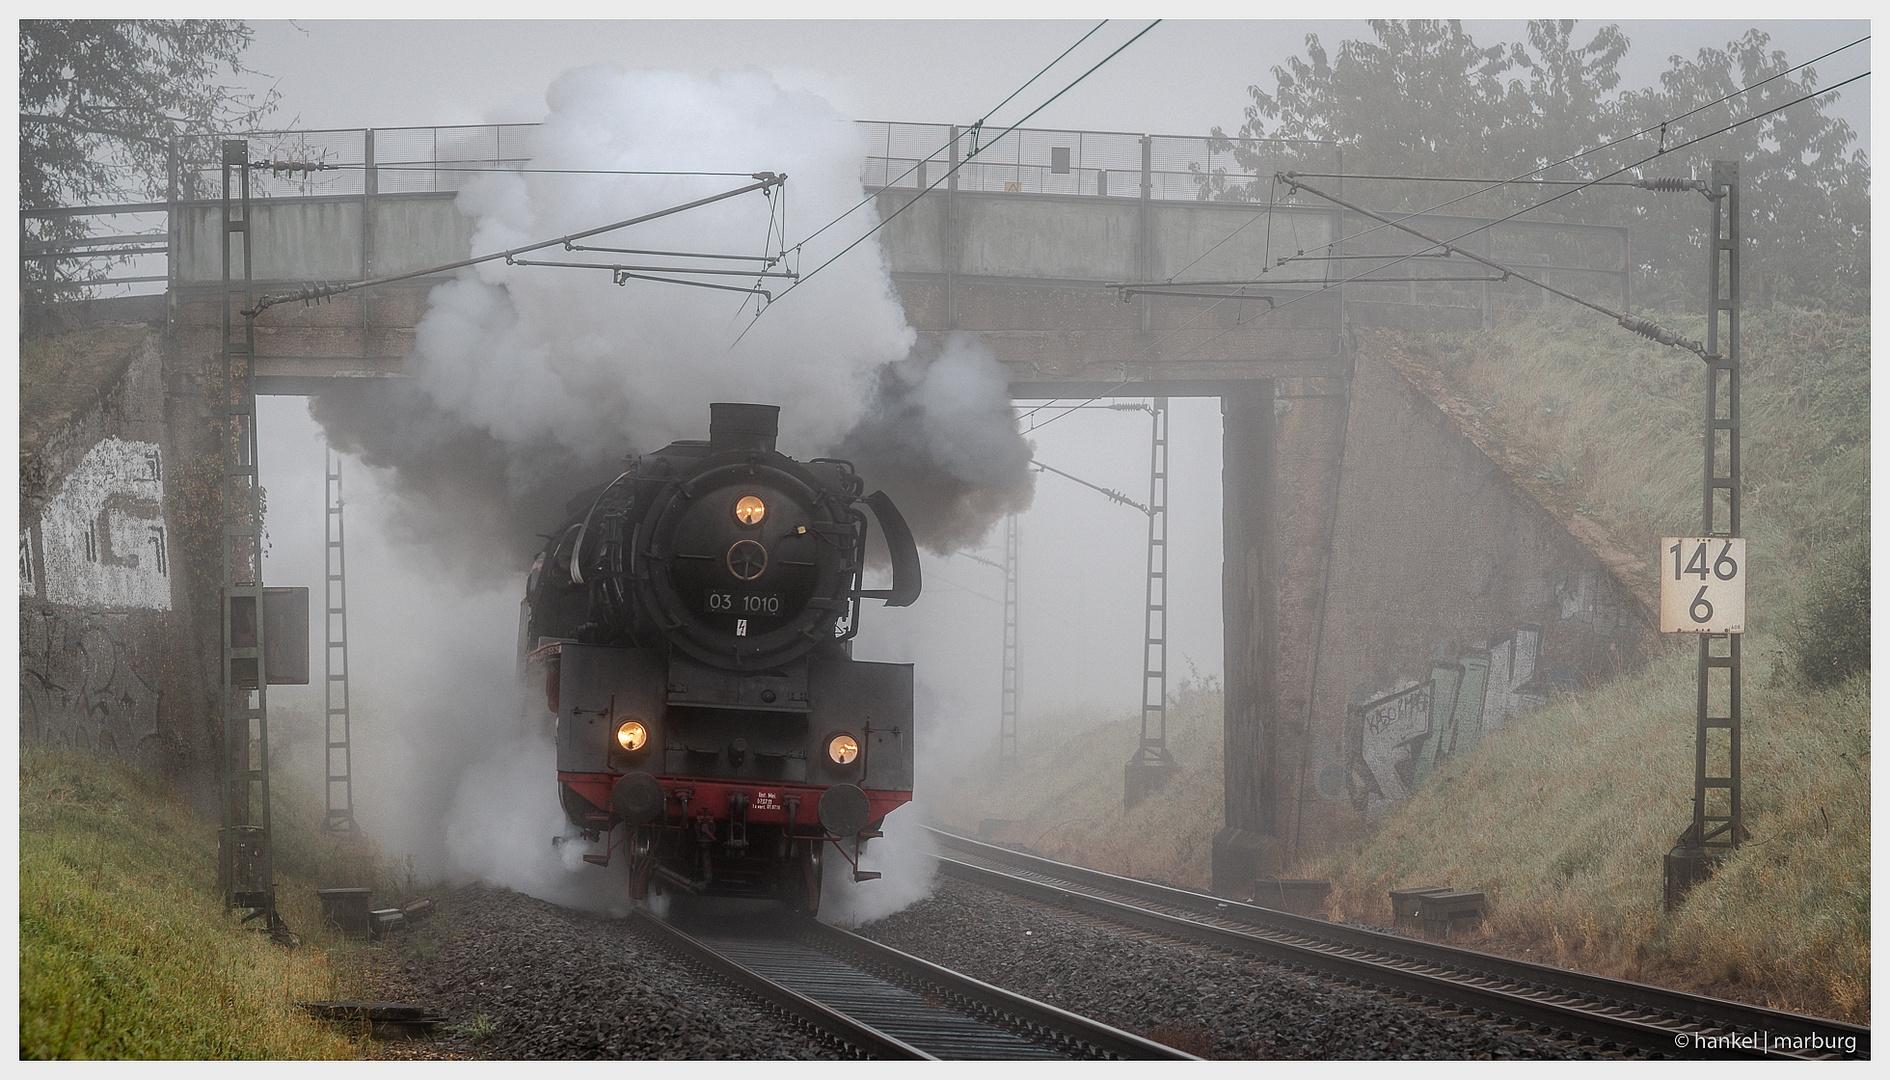 Dampflok im Nebel